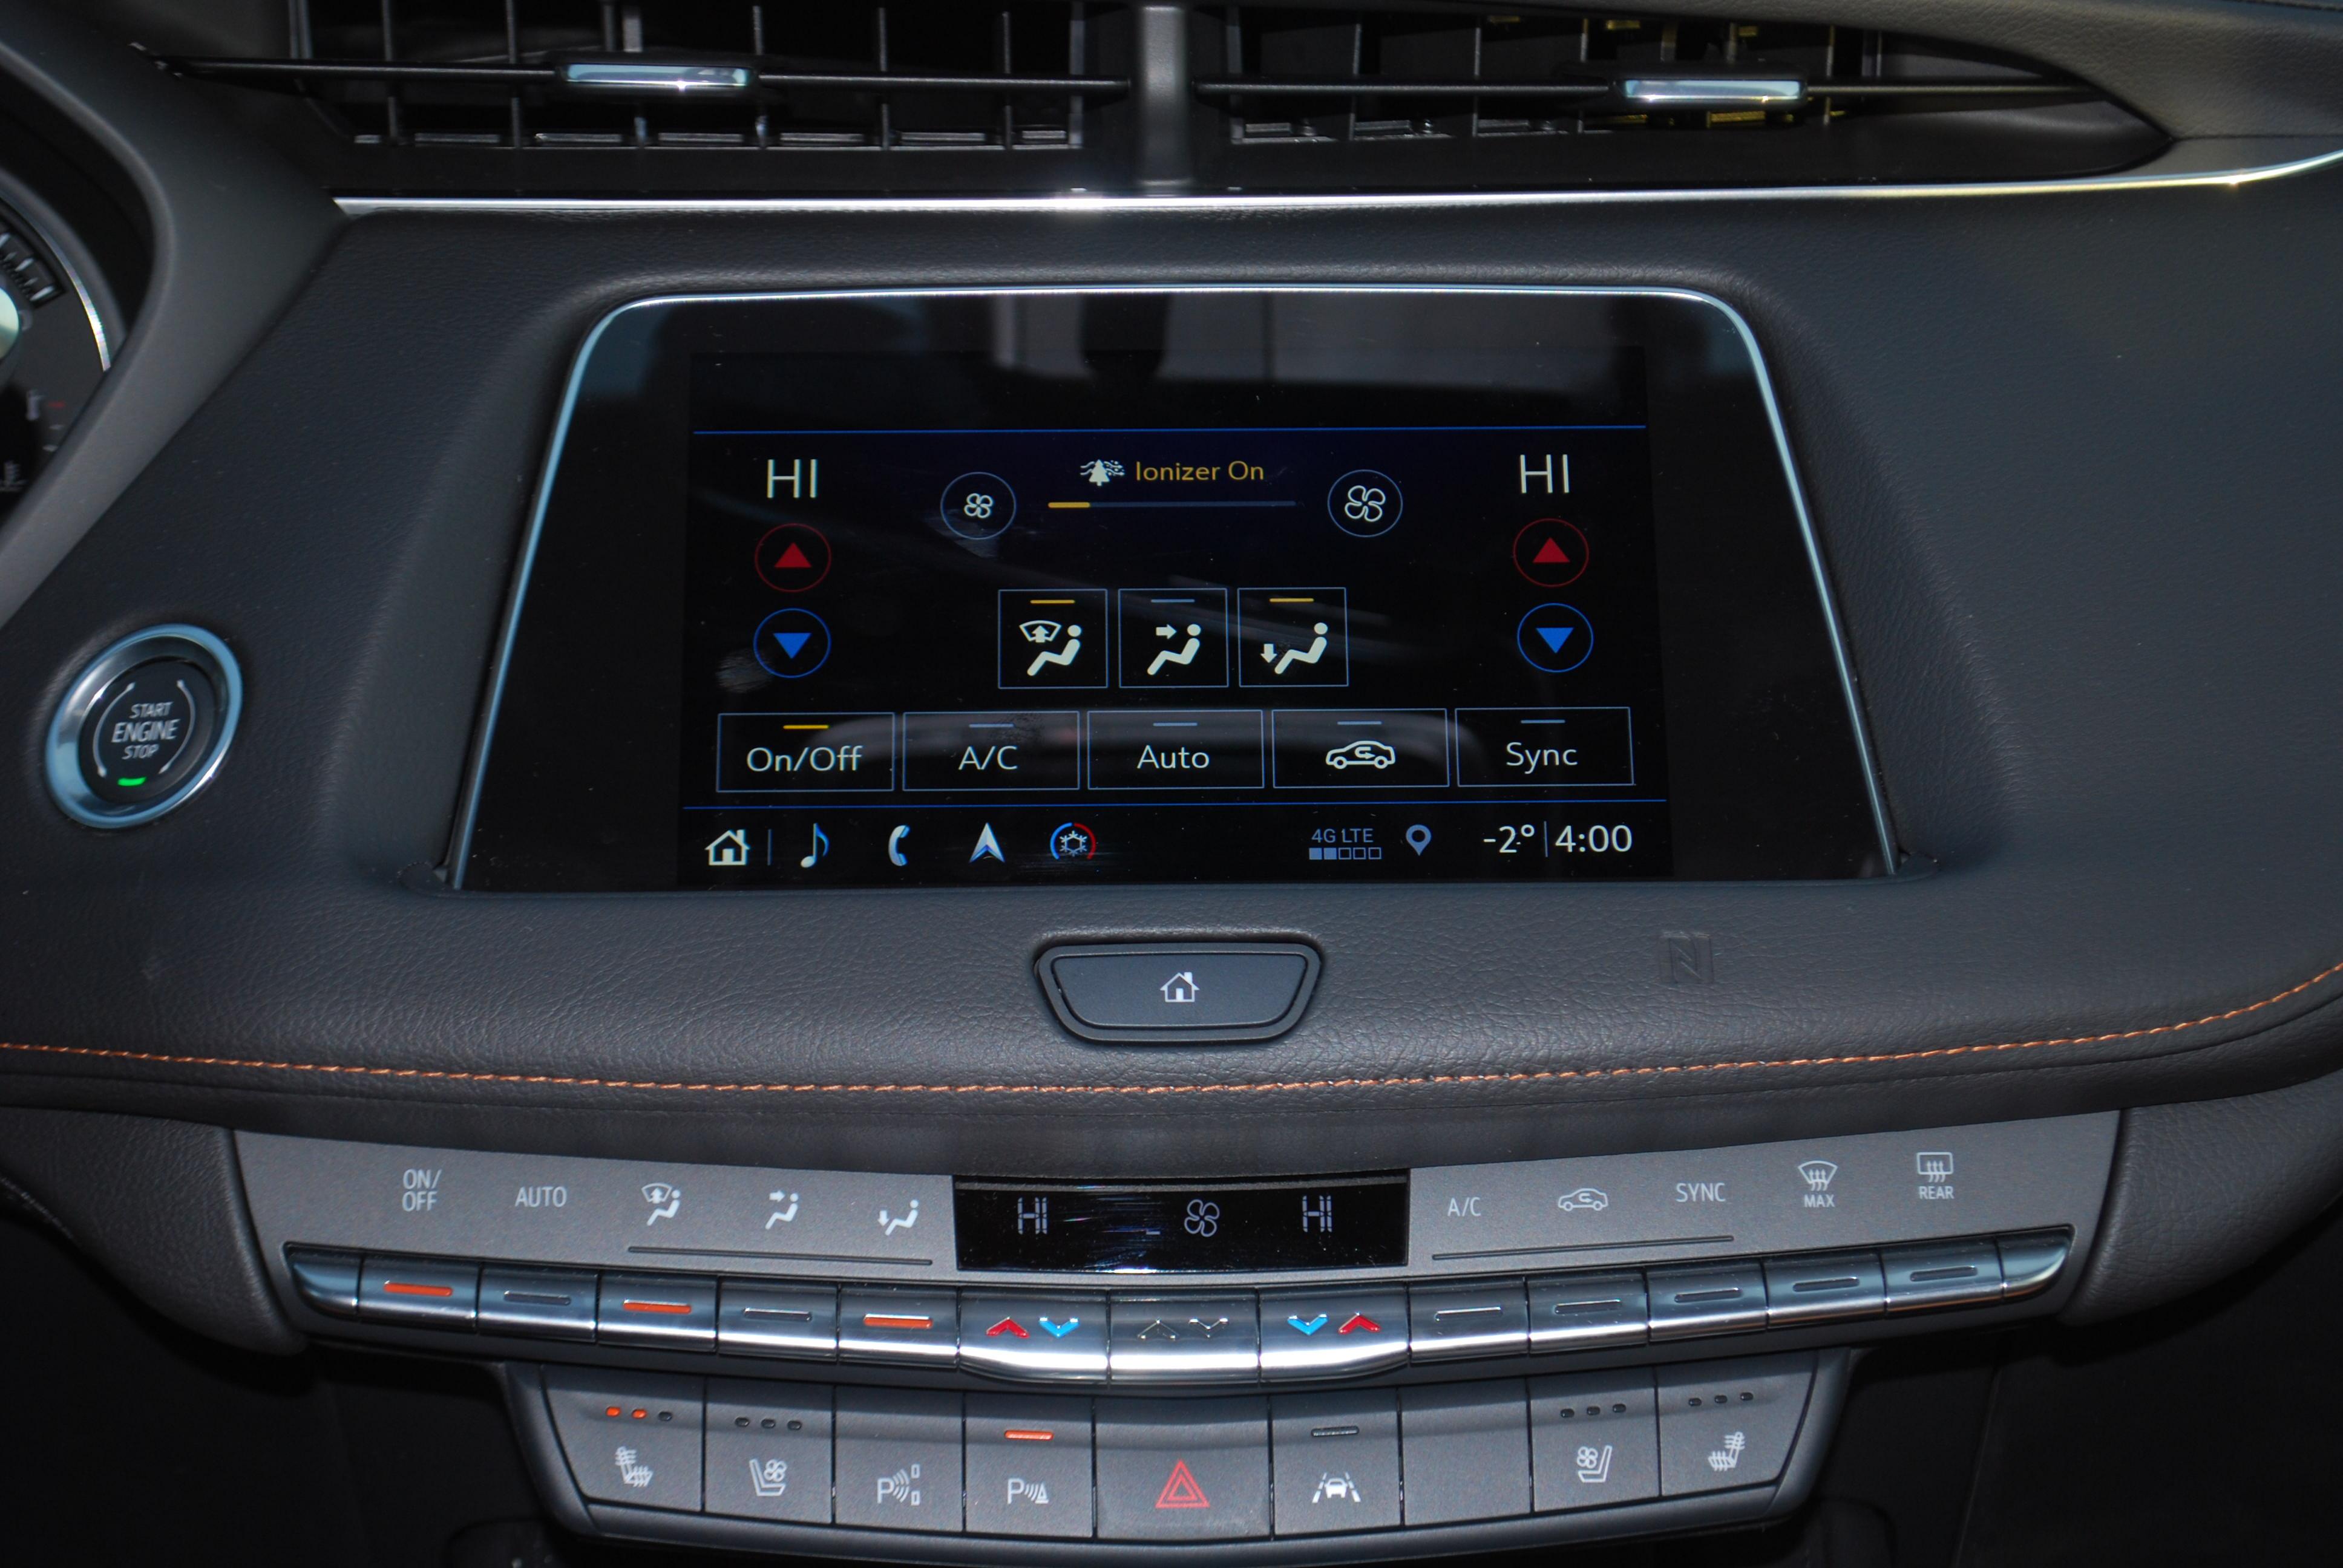 Review 2019 Cadillac XT4 Premium Luxury